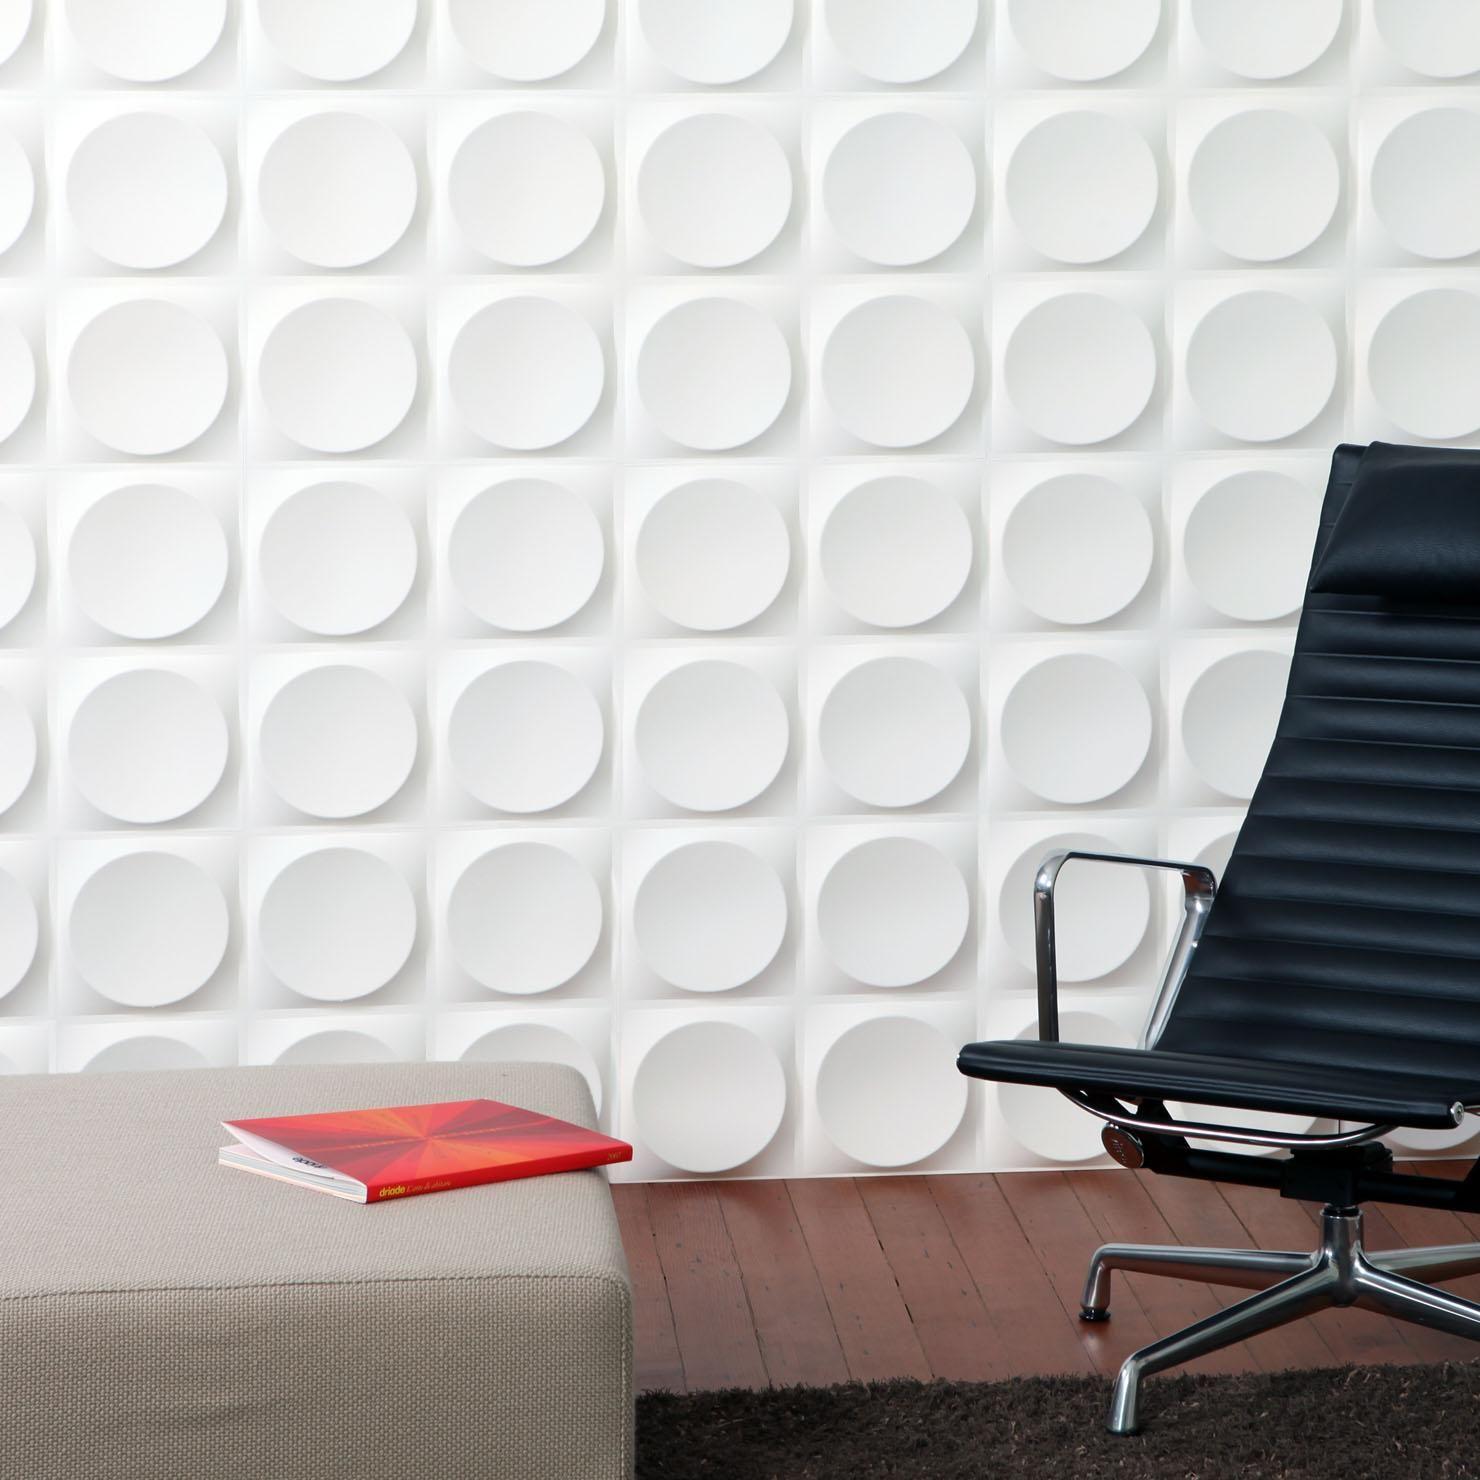 Moonscape d wall panels interiors design pinterest d wall